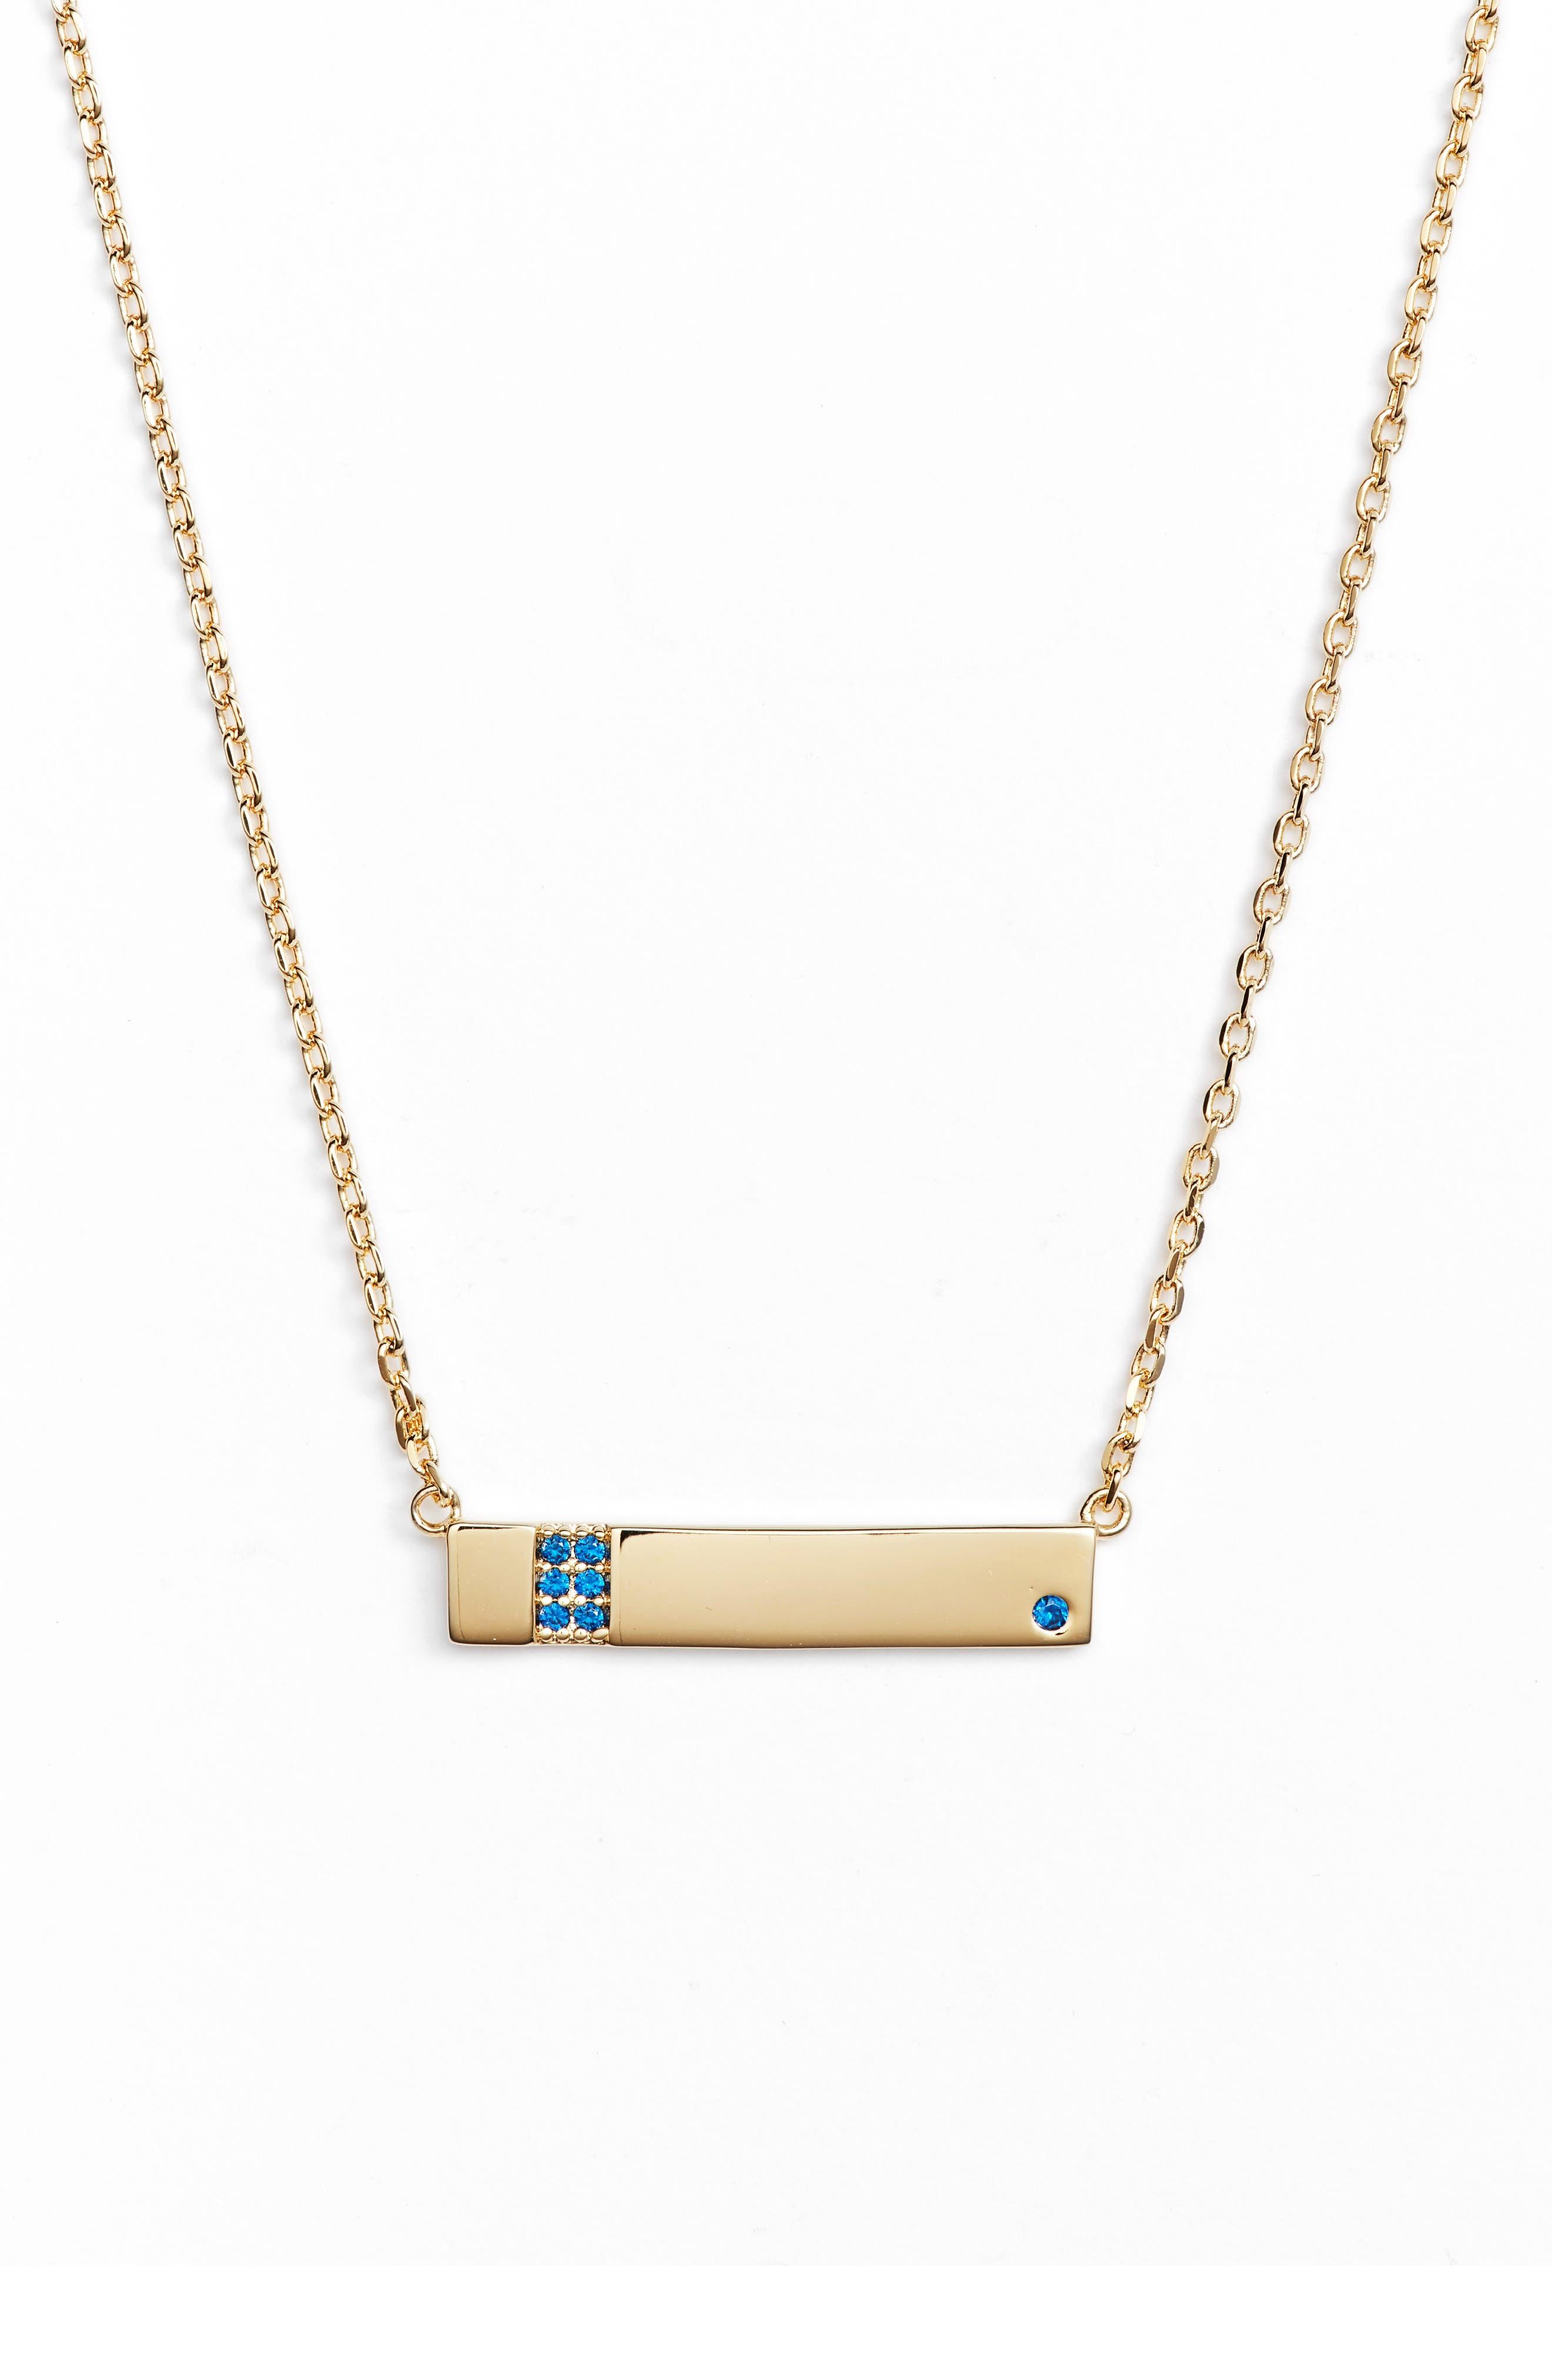 Lulu DK x We Wore What Horizontal Bar Pendant Necklace